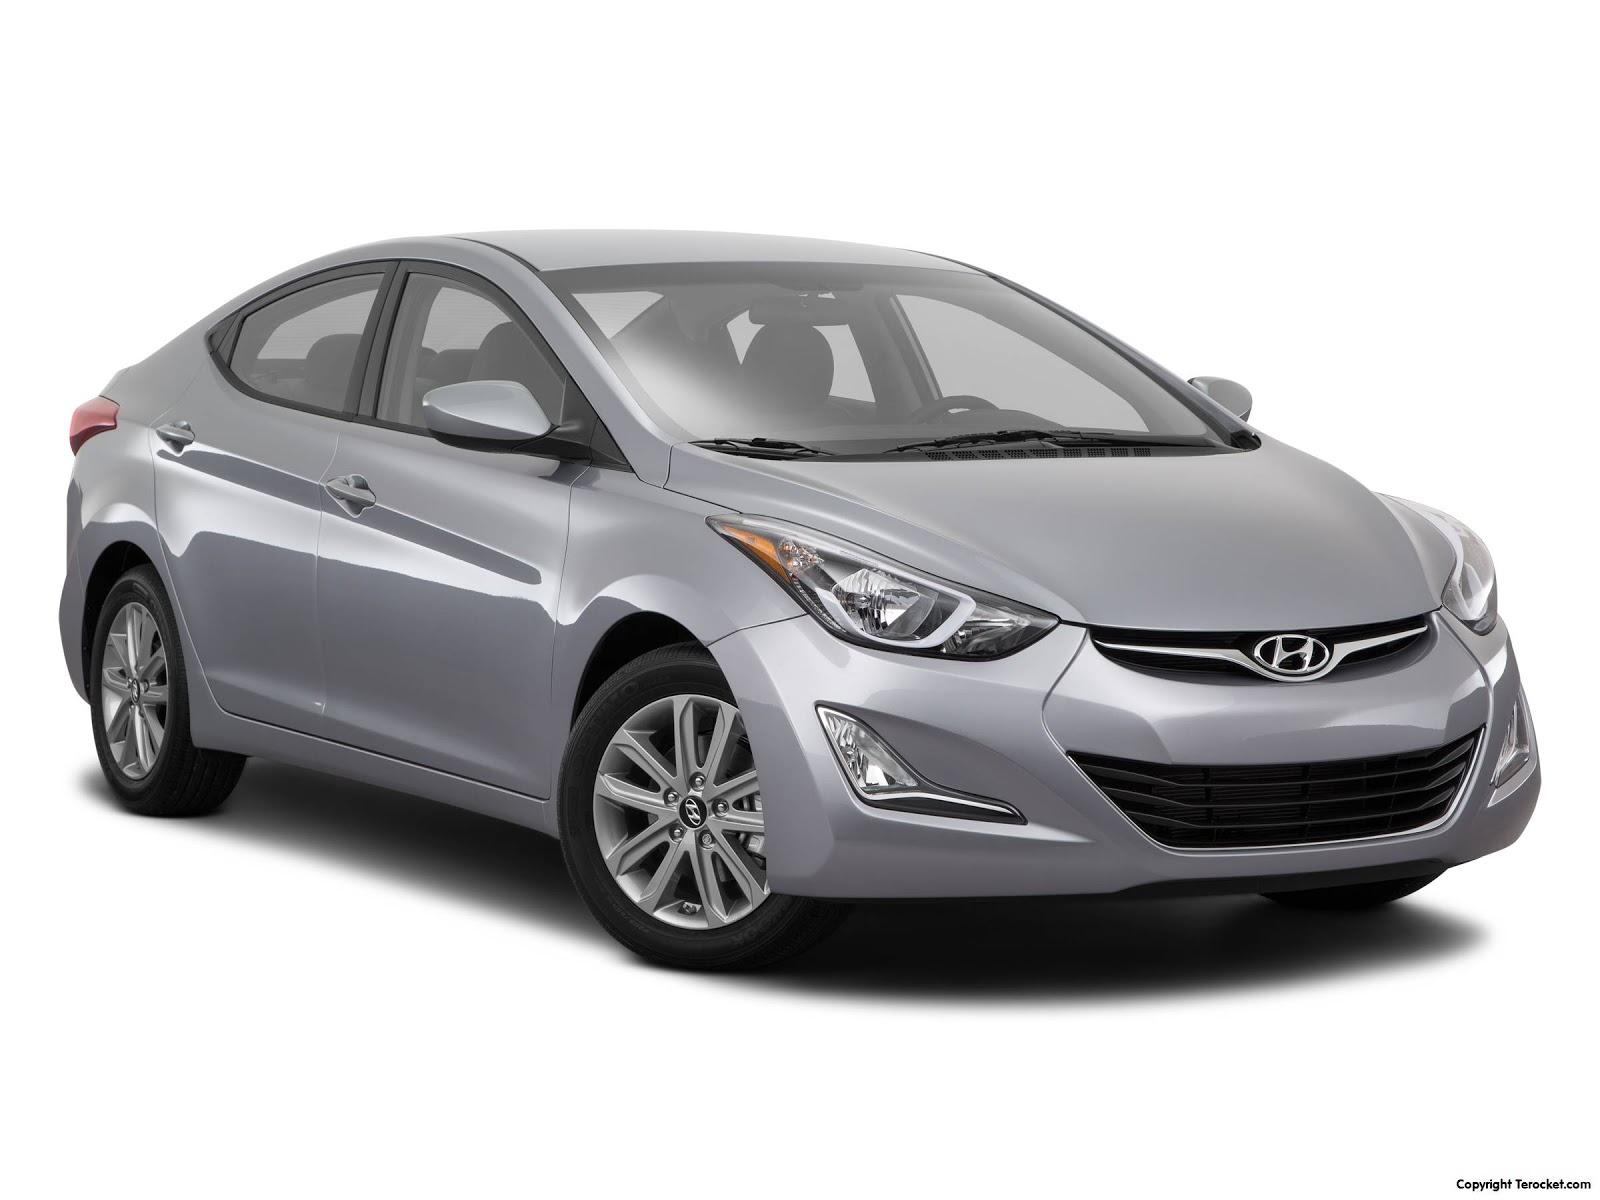 Đánh giá xe Hyundai Elantra 2016